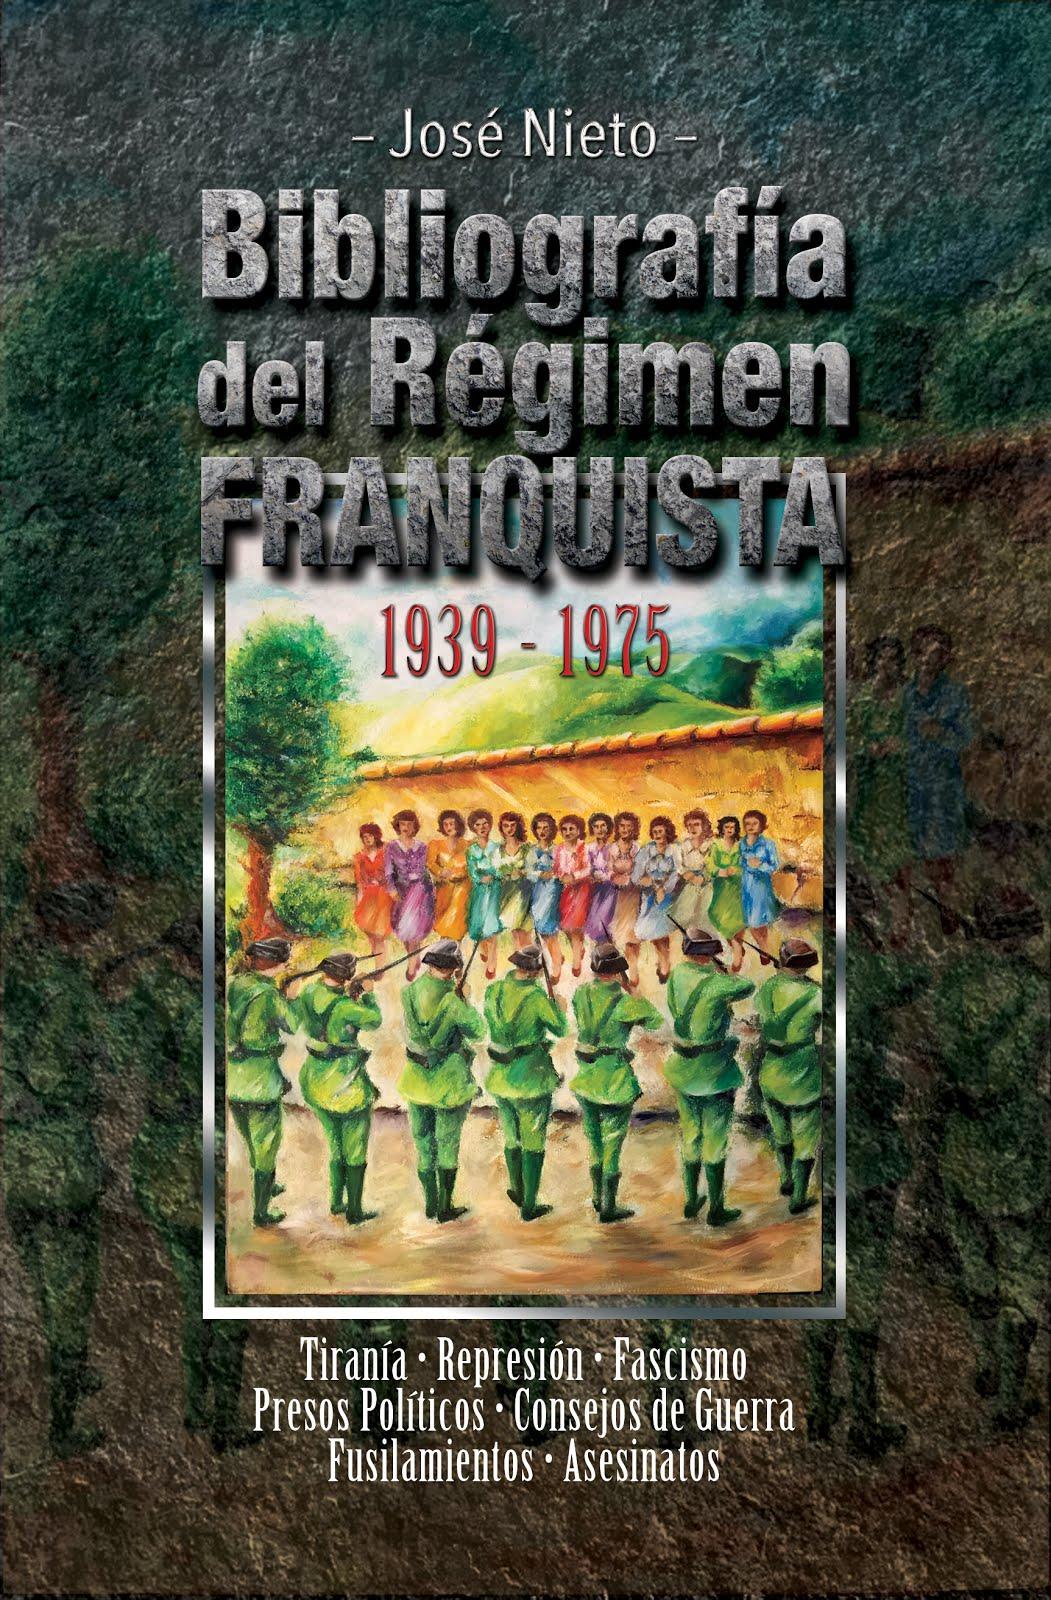 Bibliografía del Régimen Franquista 1939 - 1975